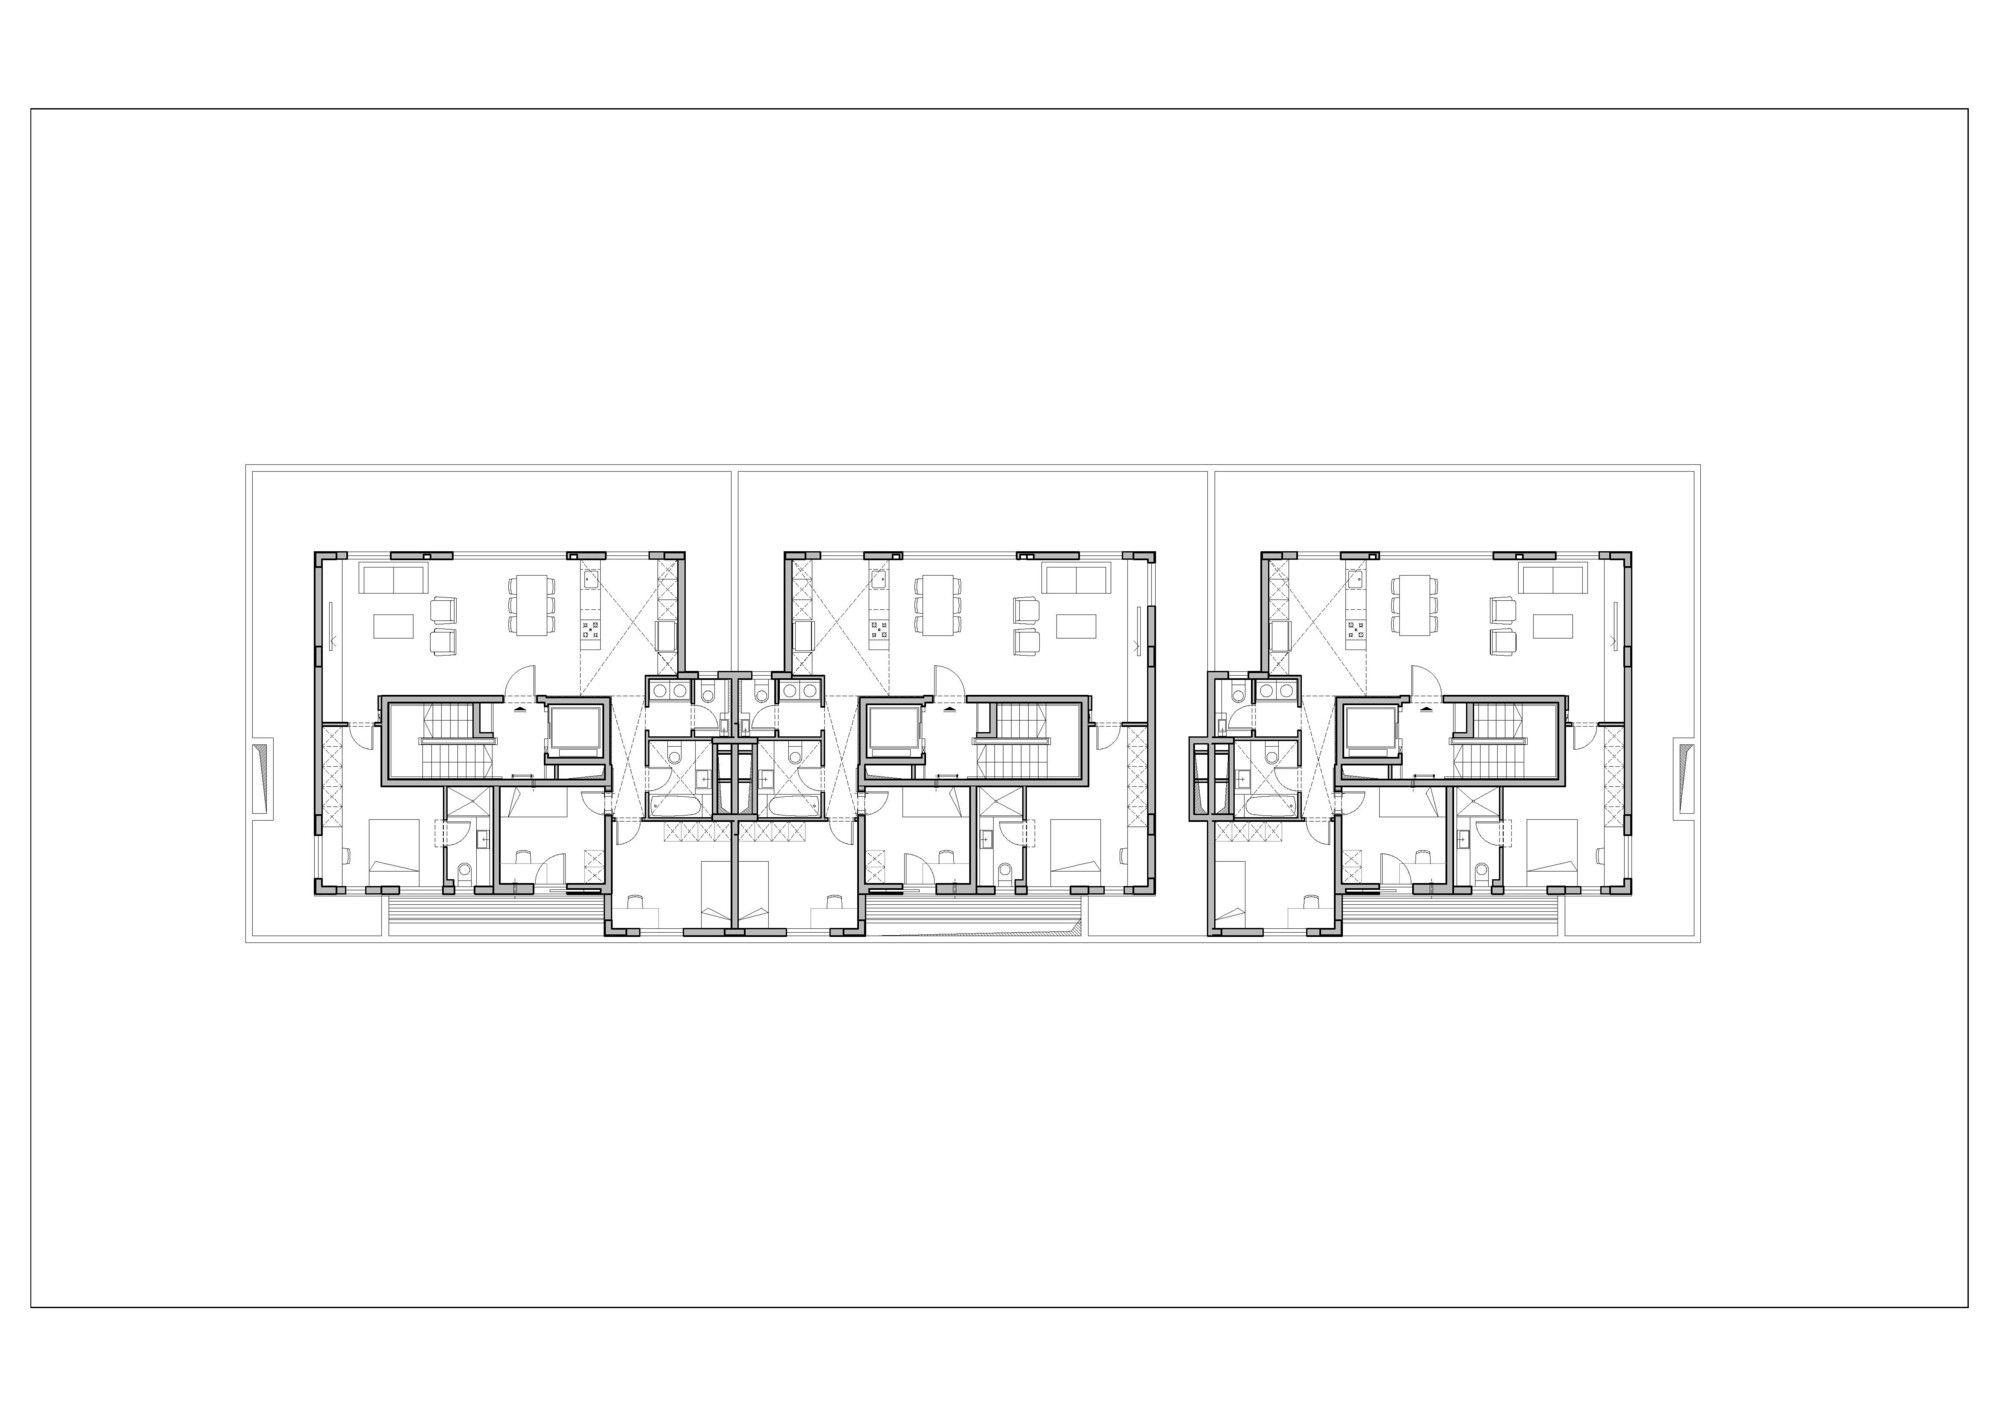 Gallery Of Ganei Shapira Affordable Housing Orit Muhlbauer Eyal Architects 9 Affordable Housing Architect Floor Plans